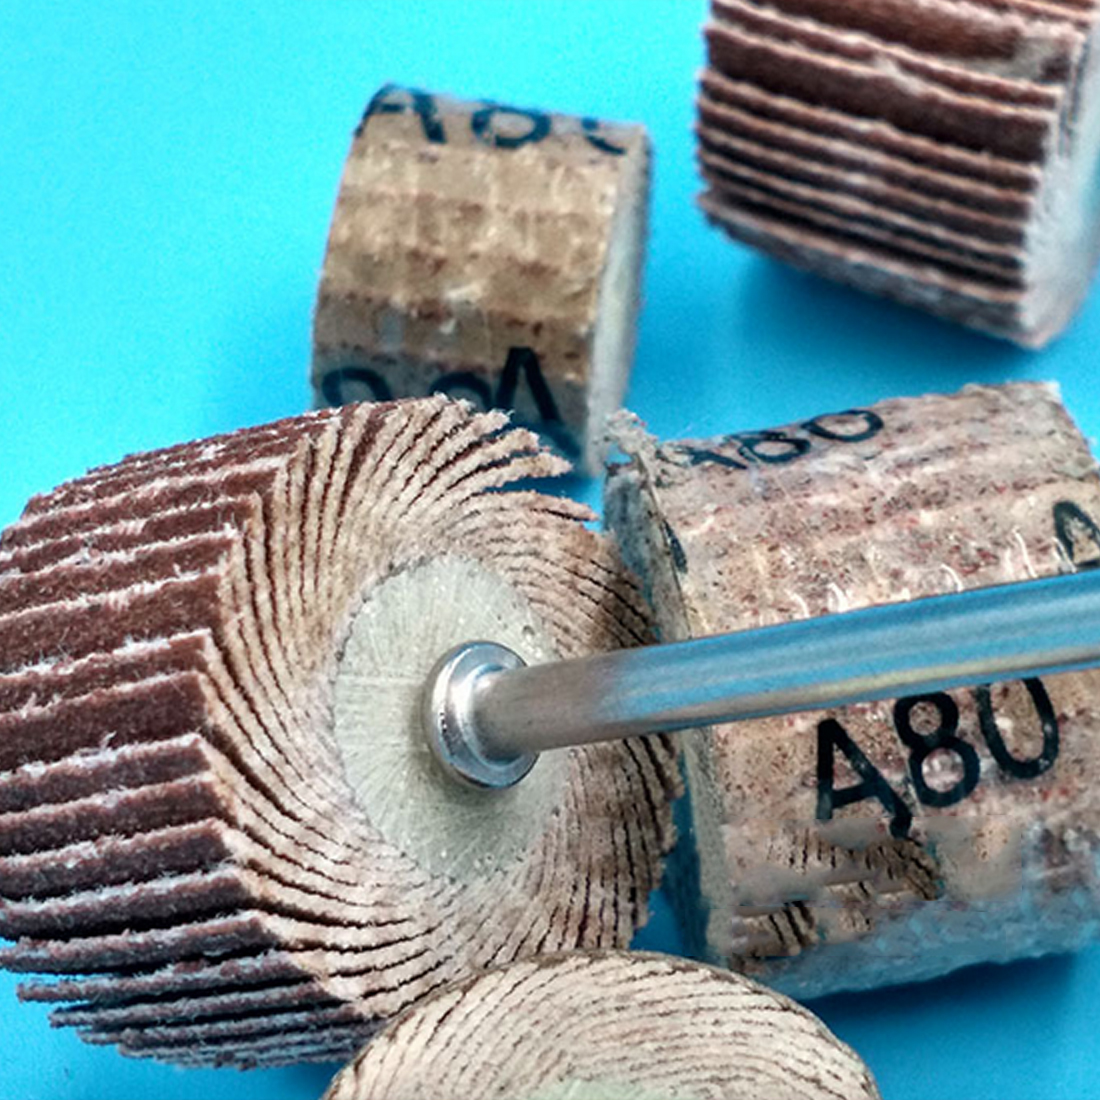 10Pcs 240-Grit 10 X 10x 3mm Sanding Flap Disc Grinding Flap Wheels Brush Sand Rotary Tool Dremel Accessories